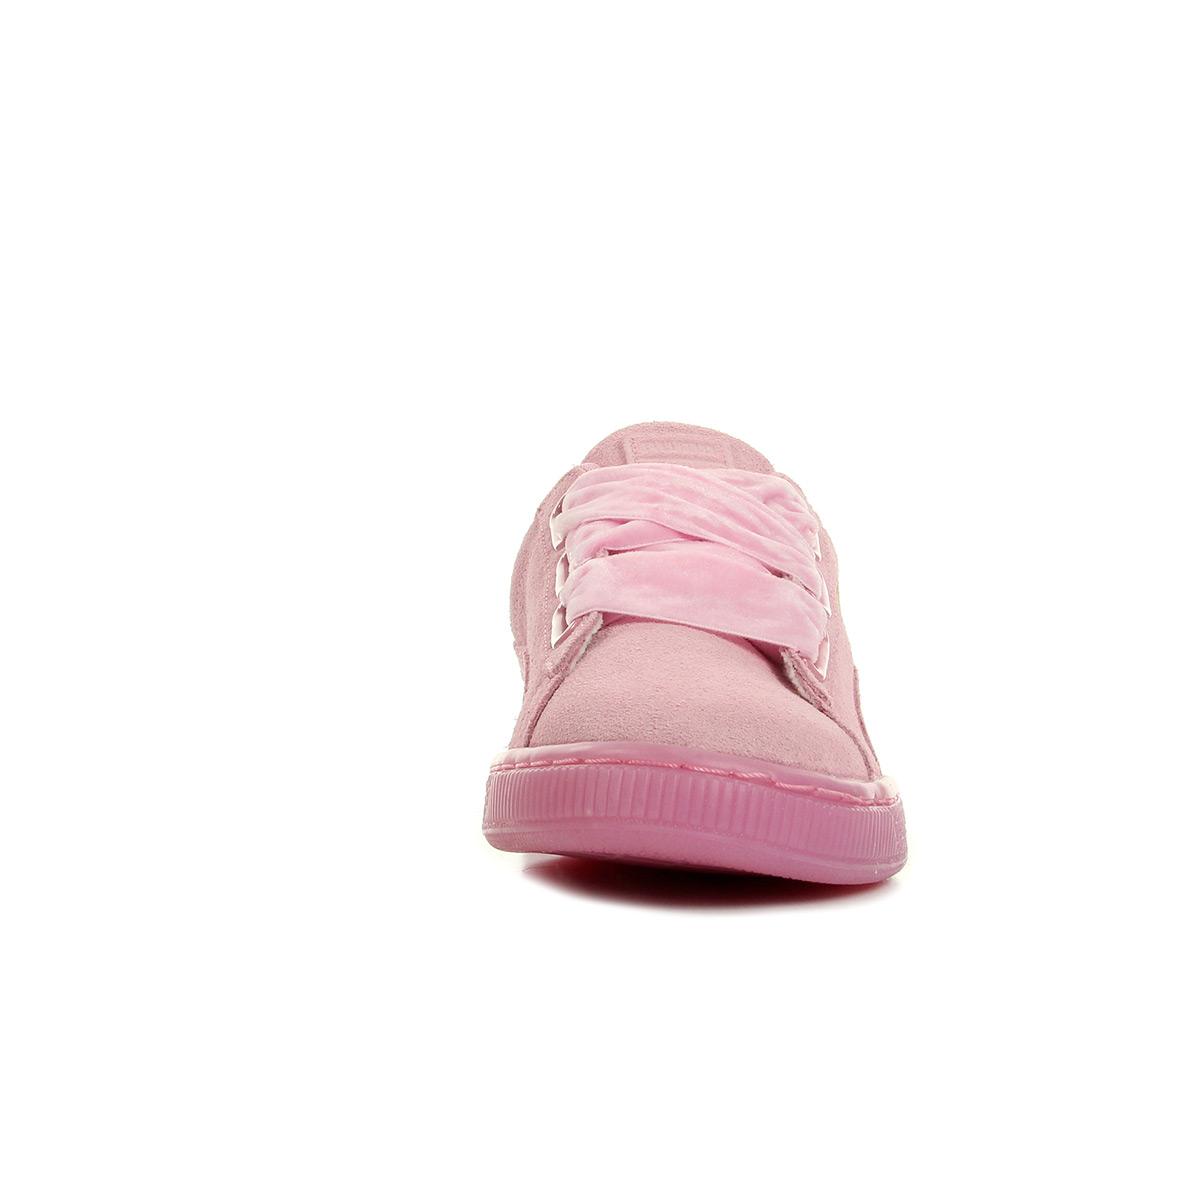 Baskets Femme À Bas Prix Prism Pink Puma Suede Heart Reset Wns